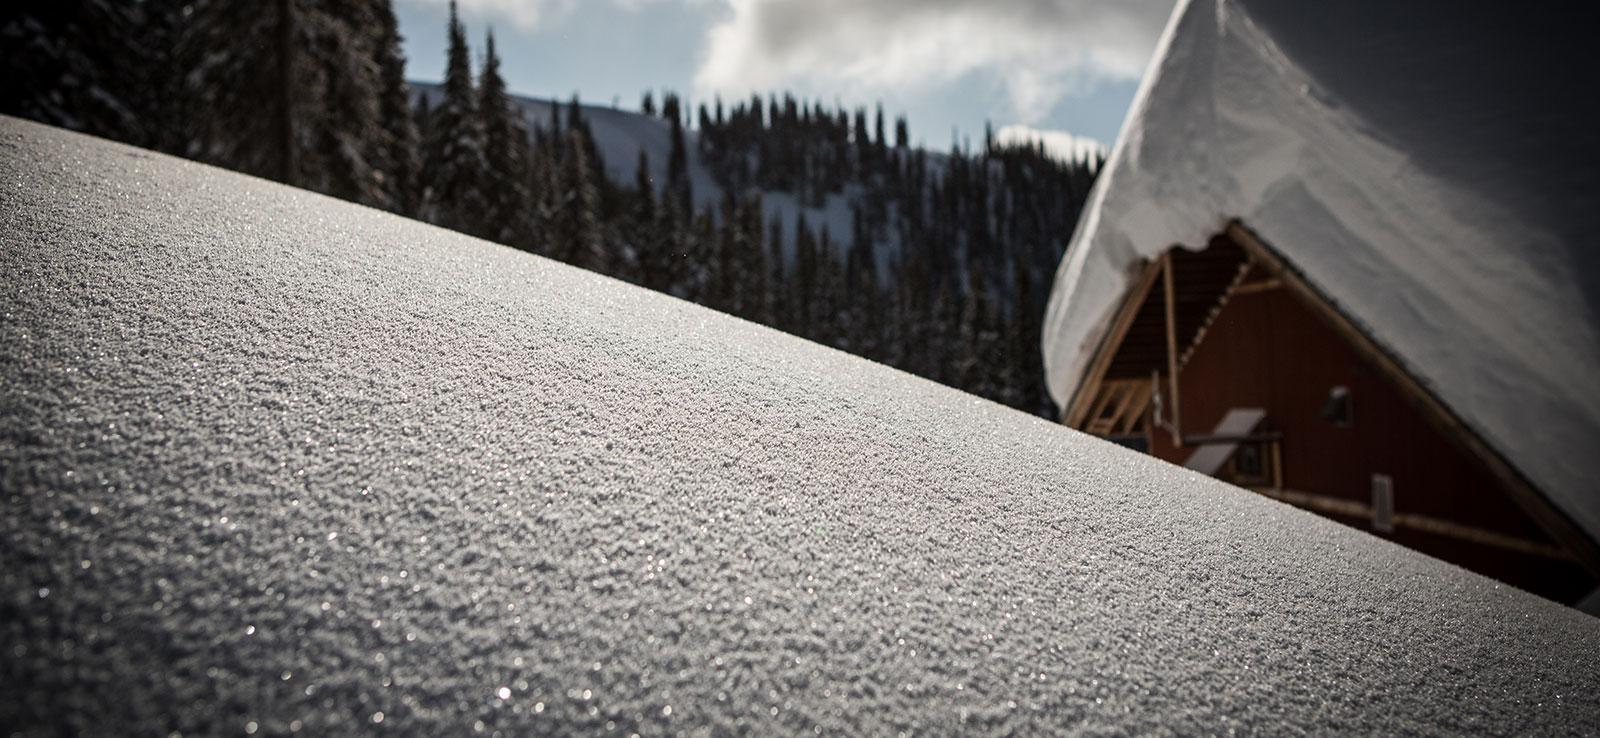 Snöfisk powder snowboarding